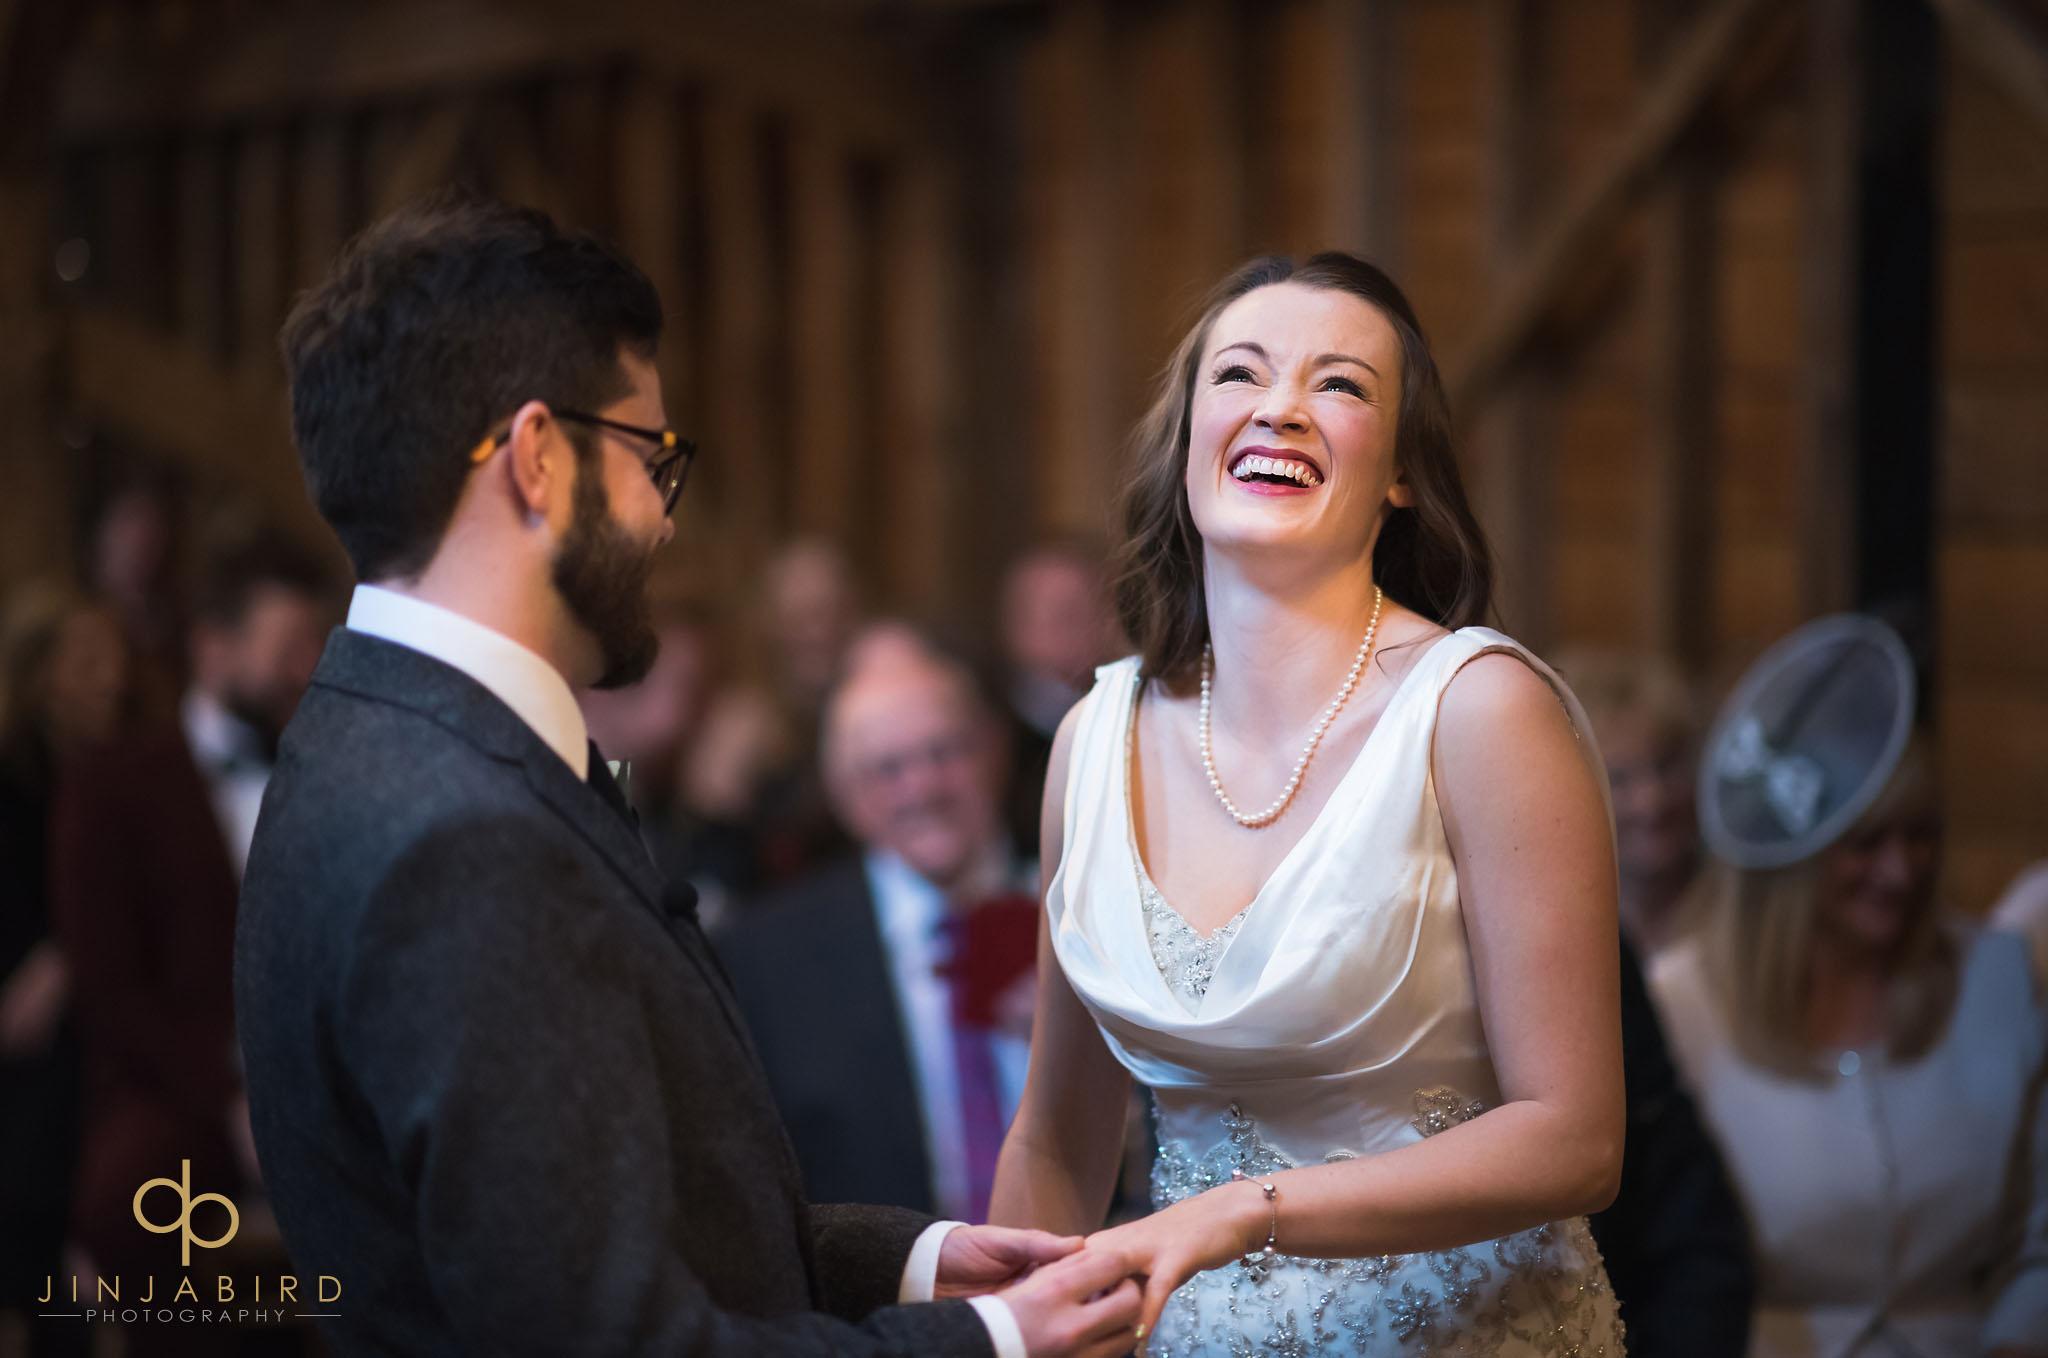 getting married rickety barn bassmead manor